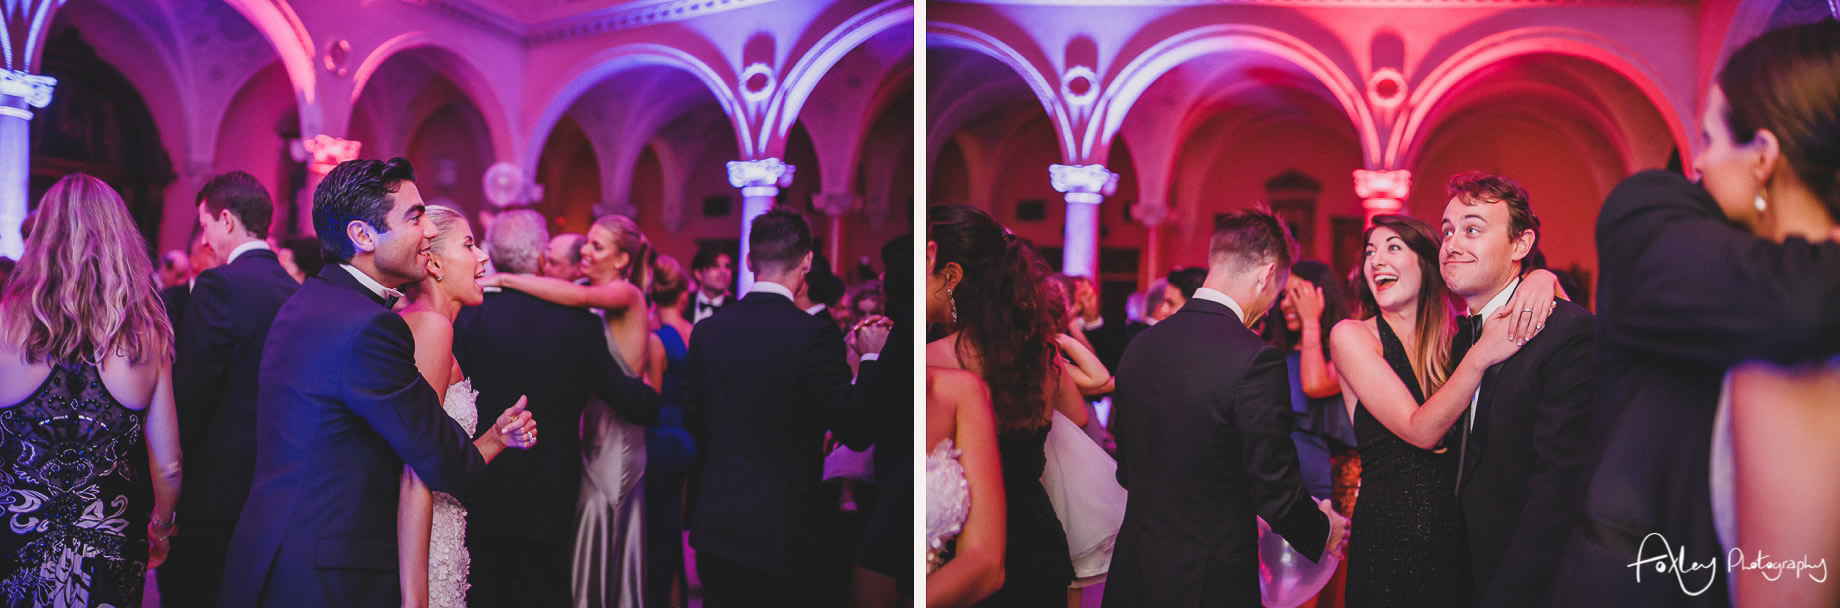 Jil and Will's Wedding at Villa Ephrussi De Rothschild 233